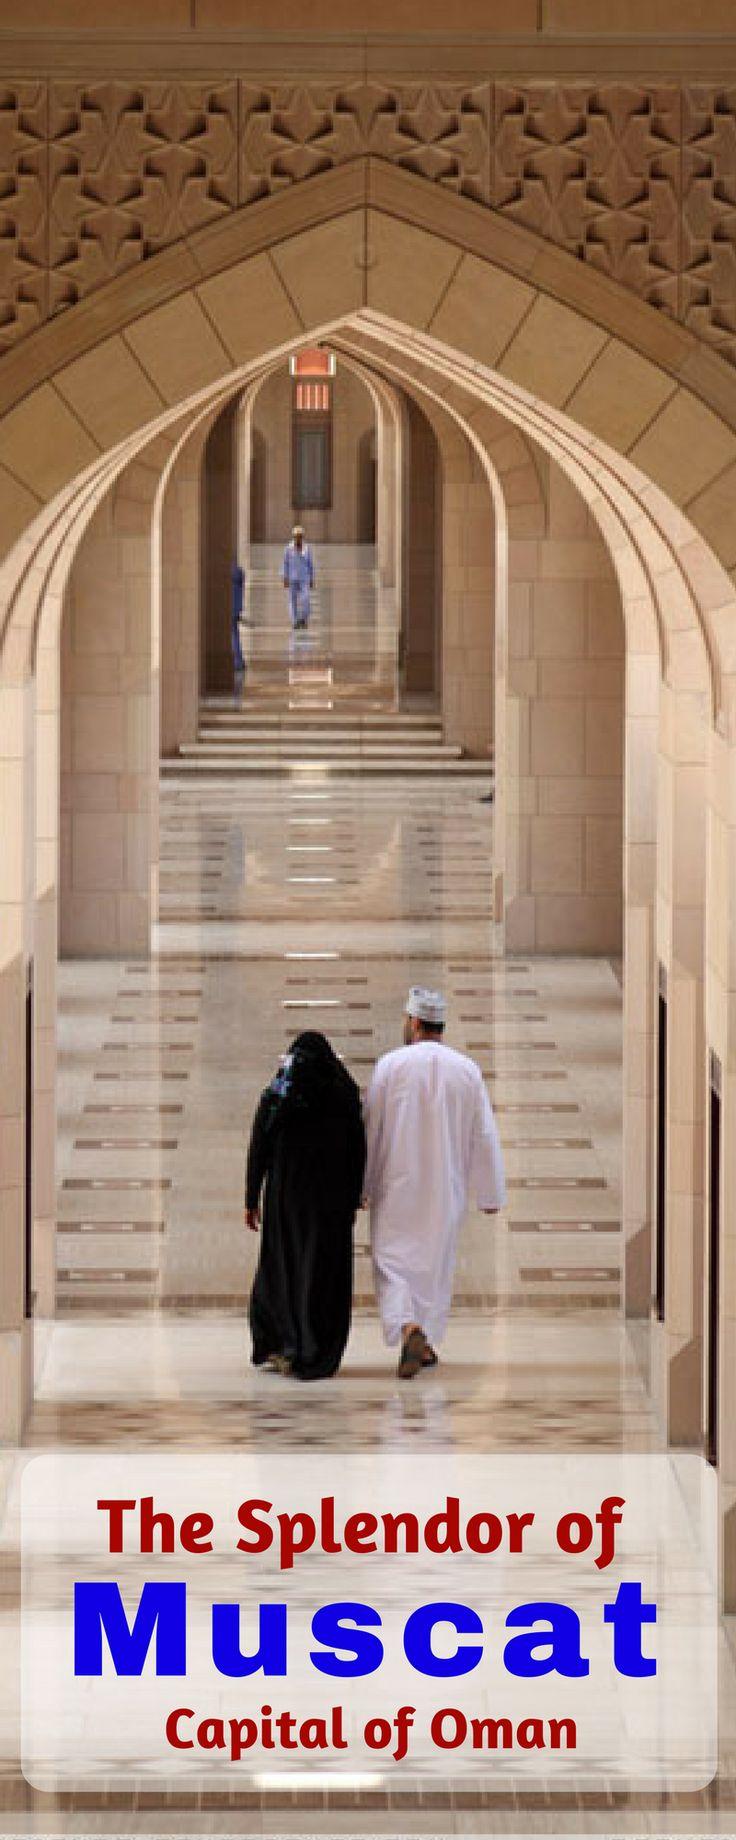 The Splendor of Muscat Capital of